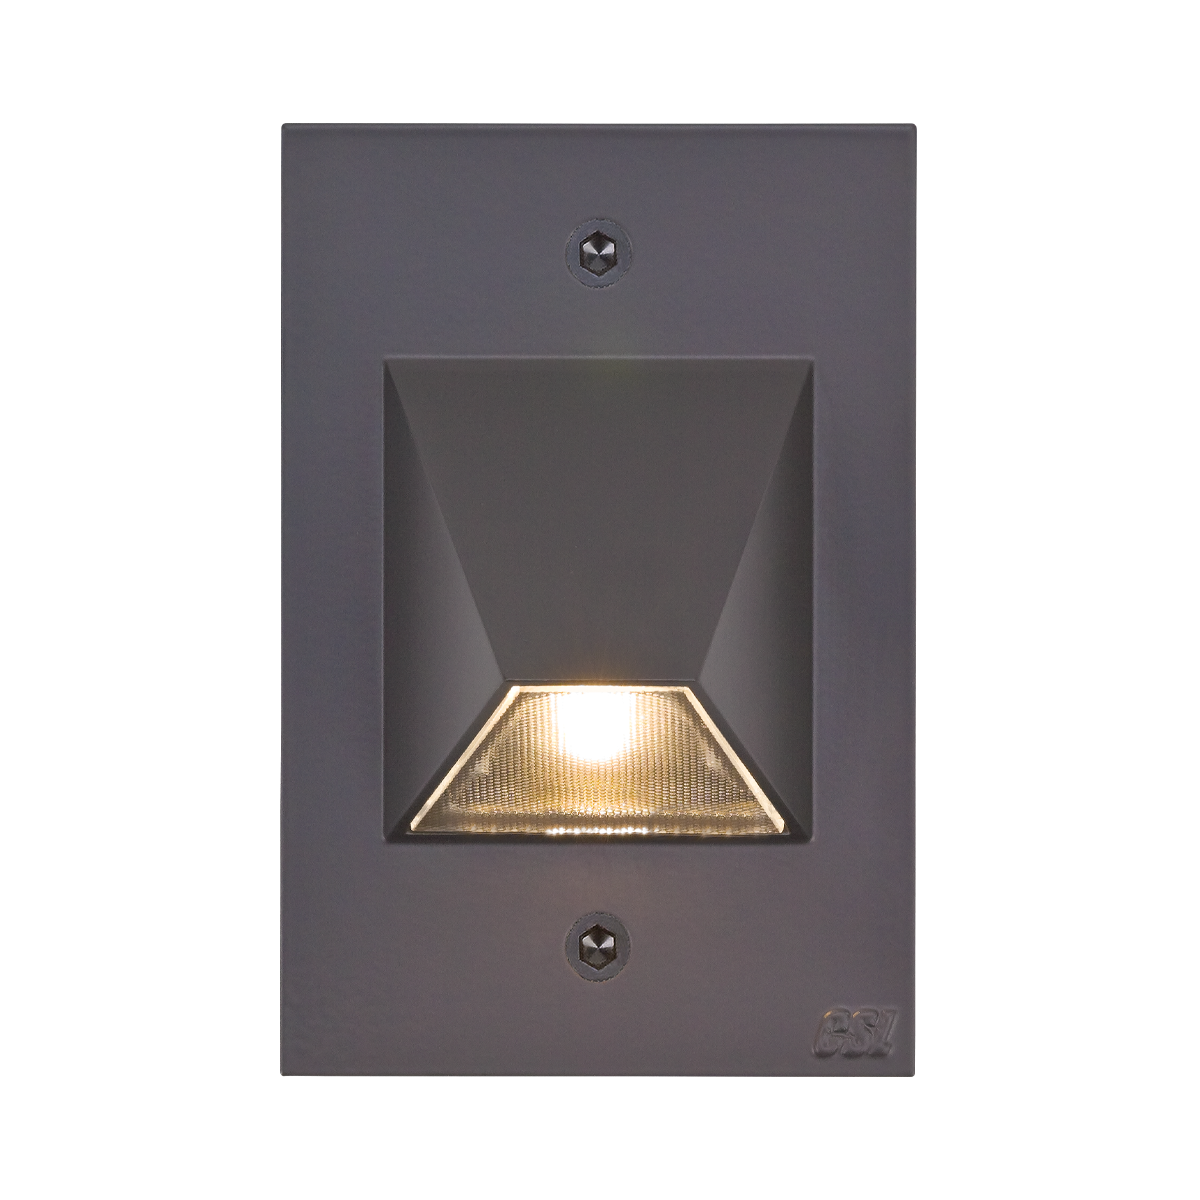 "4-1 - 2"" x 3"" LED Step Light, Bronze Finish"